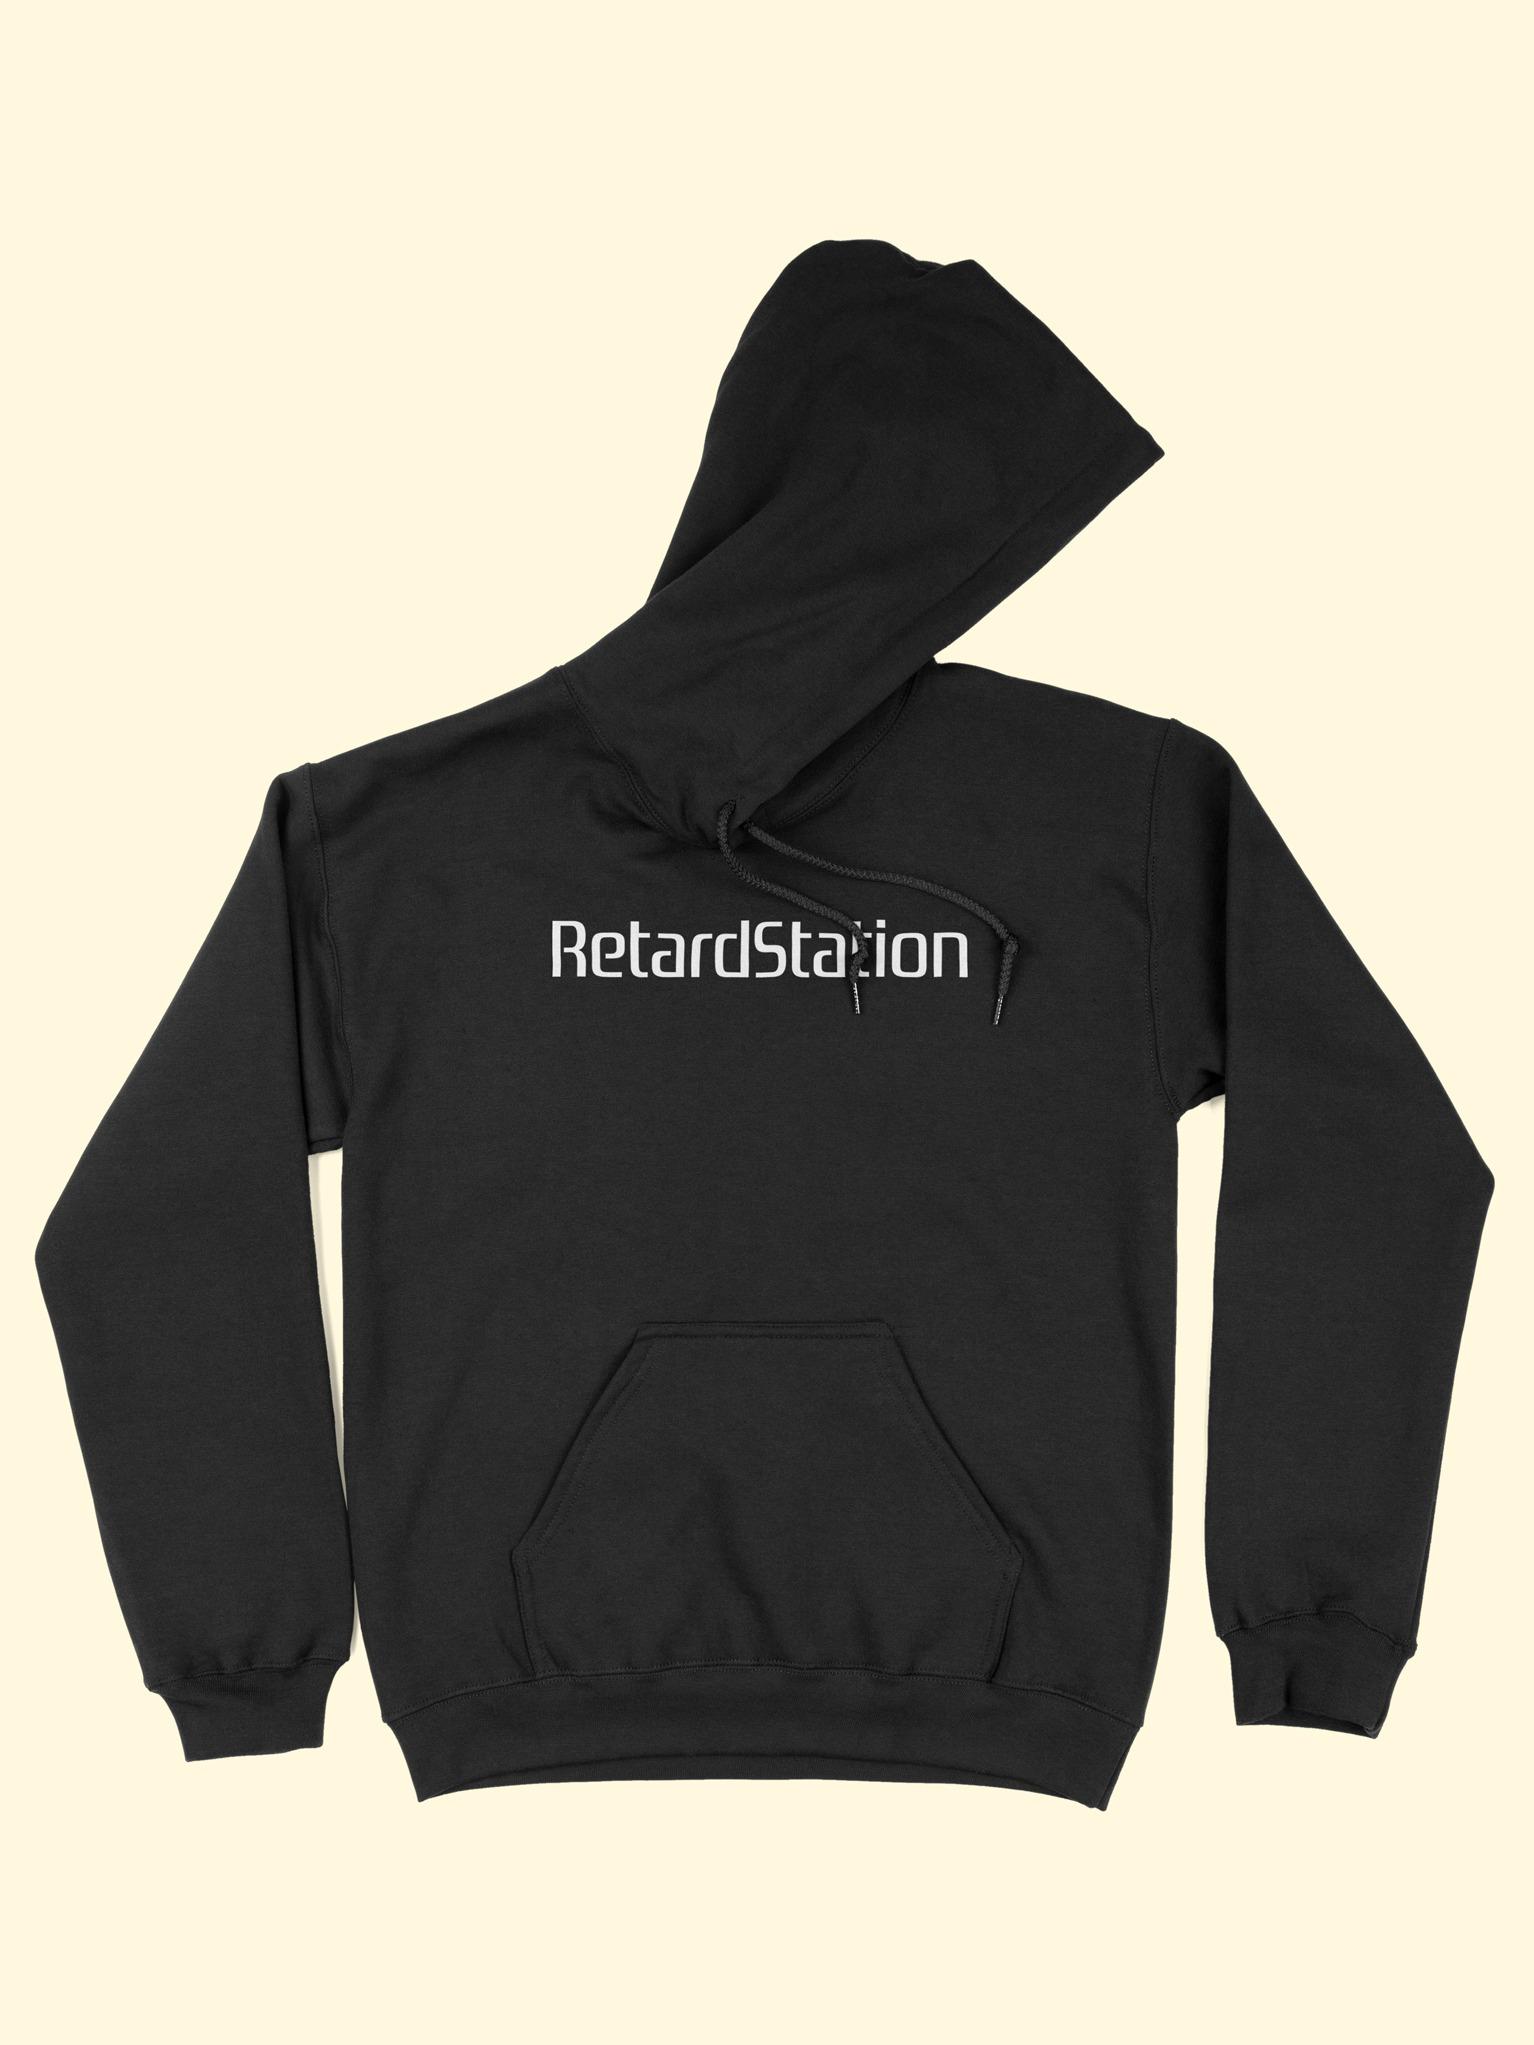 RetardStation Hoodie product image (1)